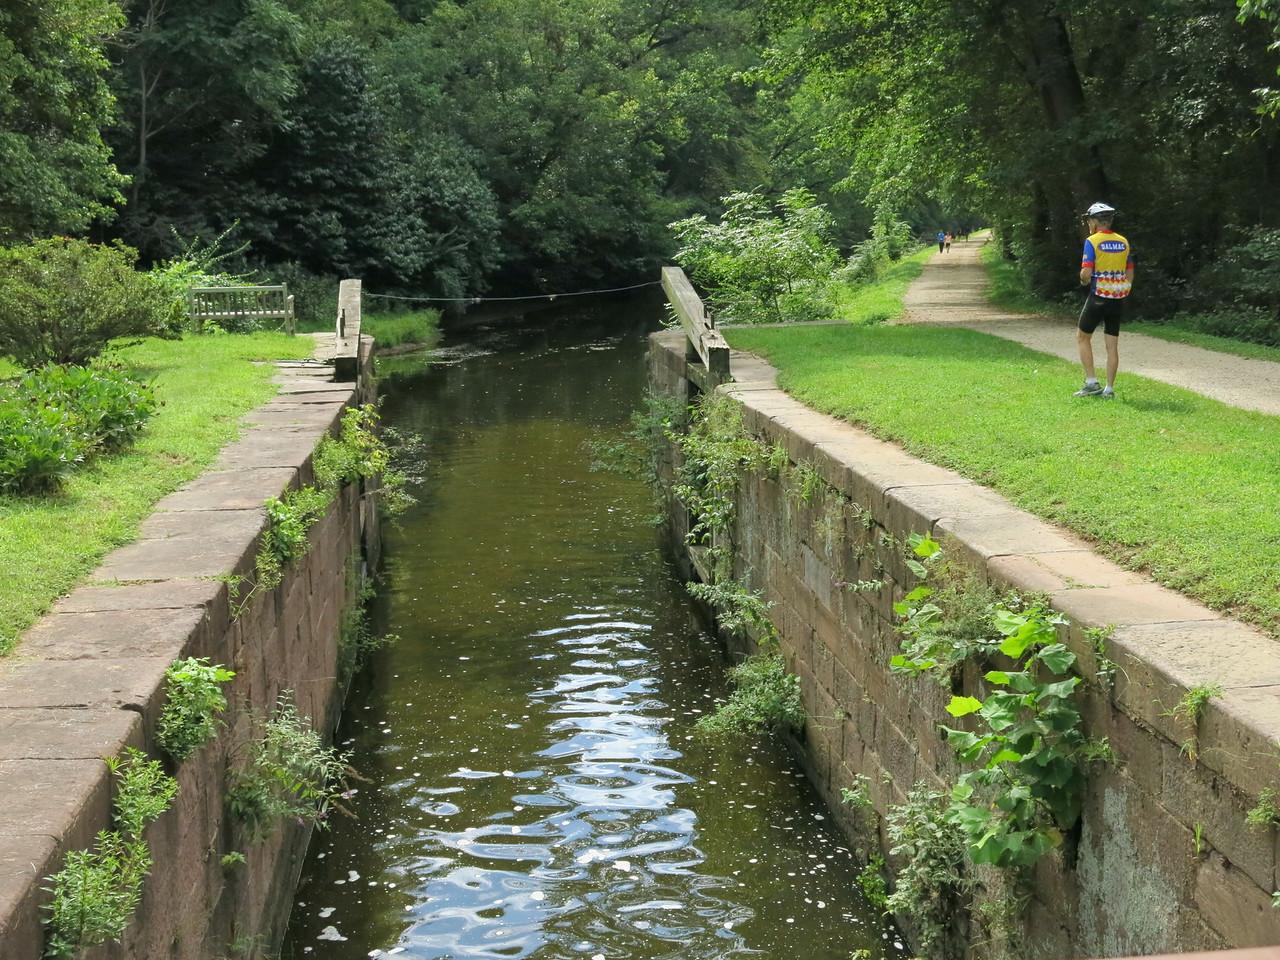 Looking downstream through Lock 21